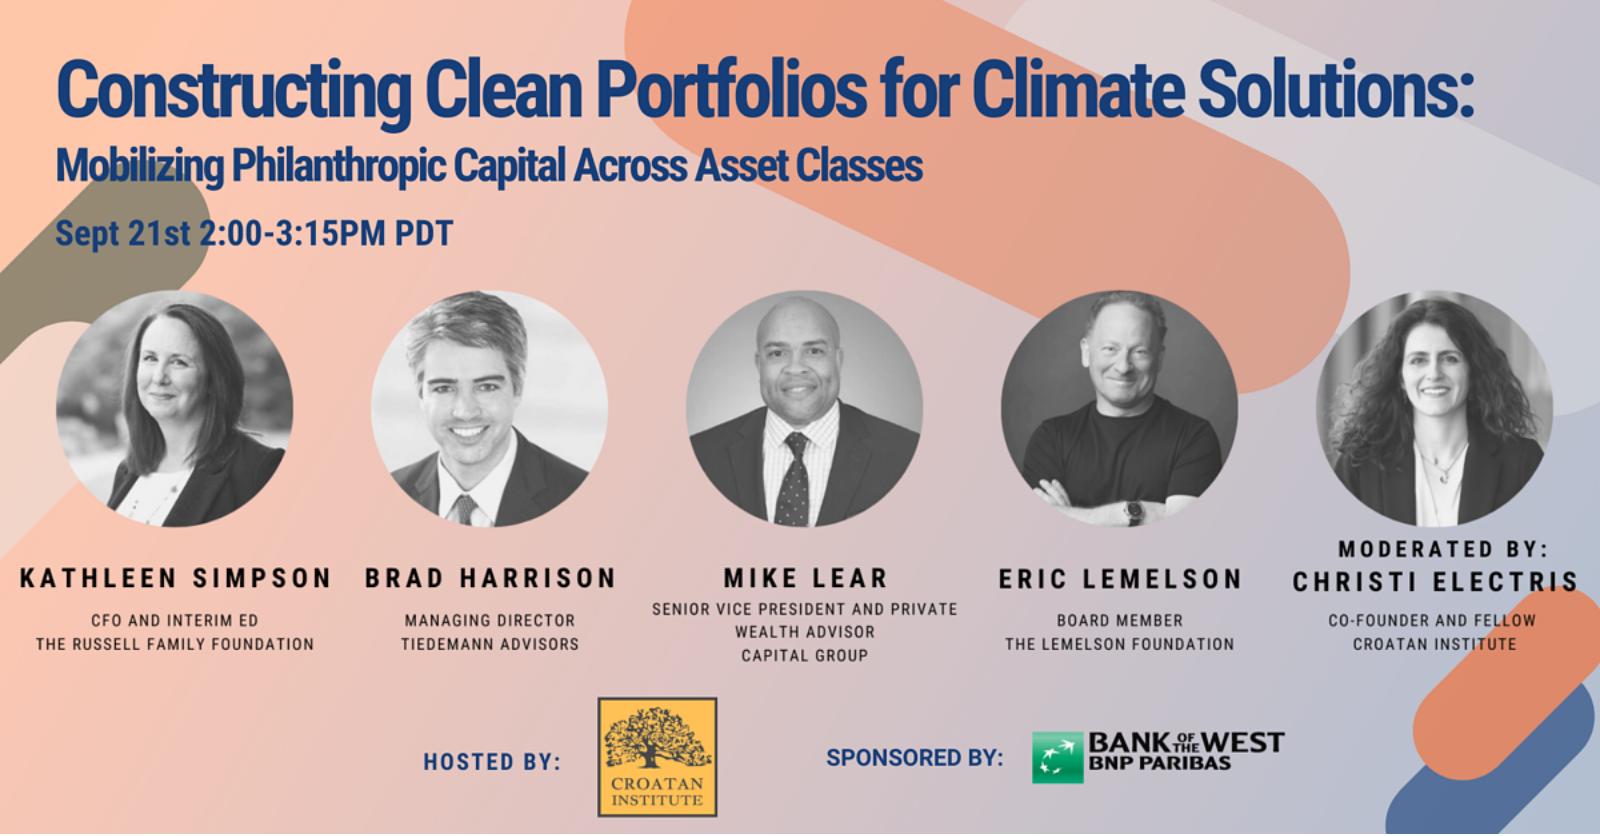 Mobilizing Philanthropic Capital Across Asset Classes